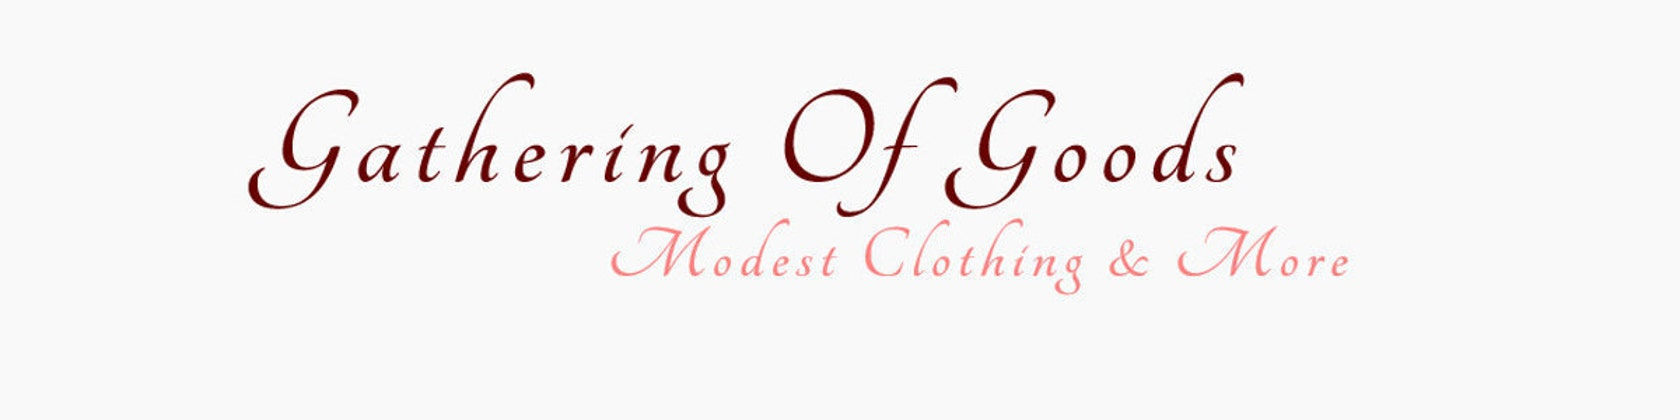 Modest Clothing Historical Garments von GatheringofGoods auf Etsy